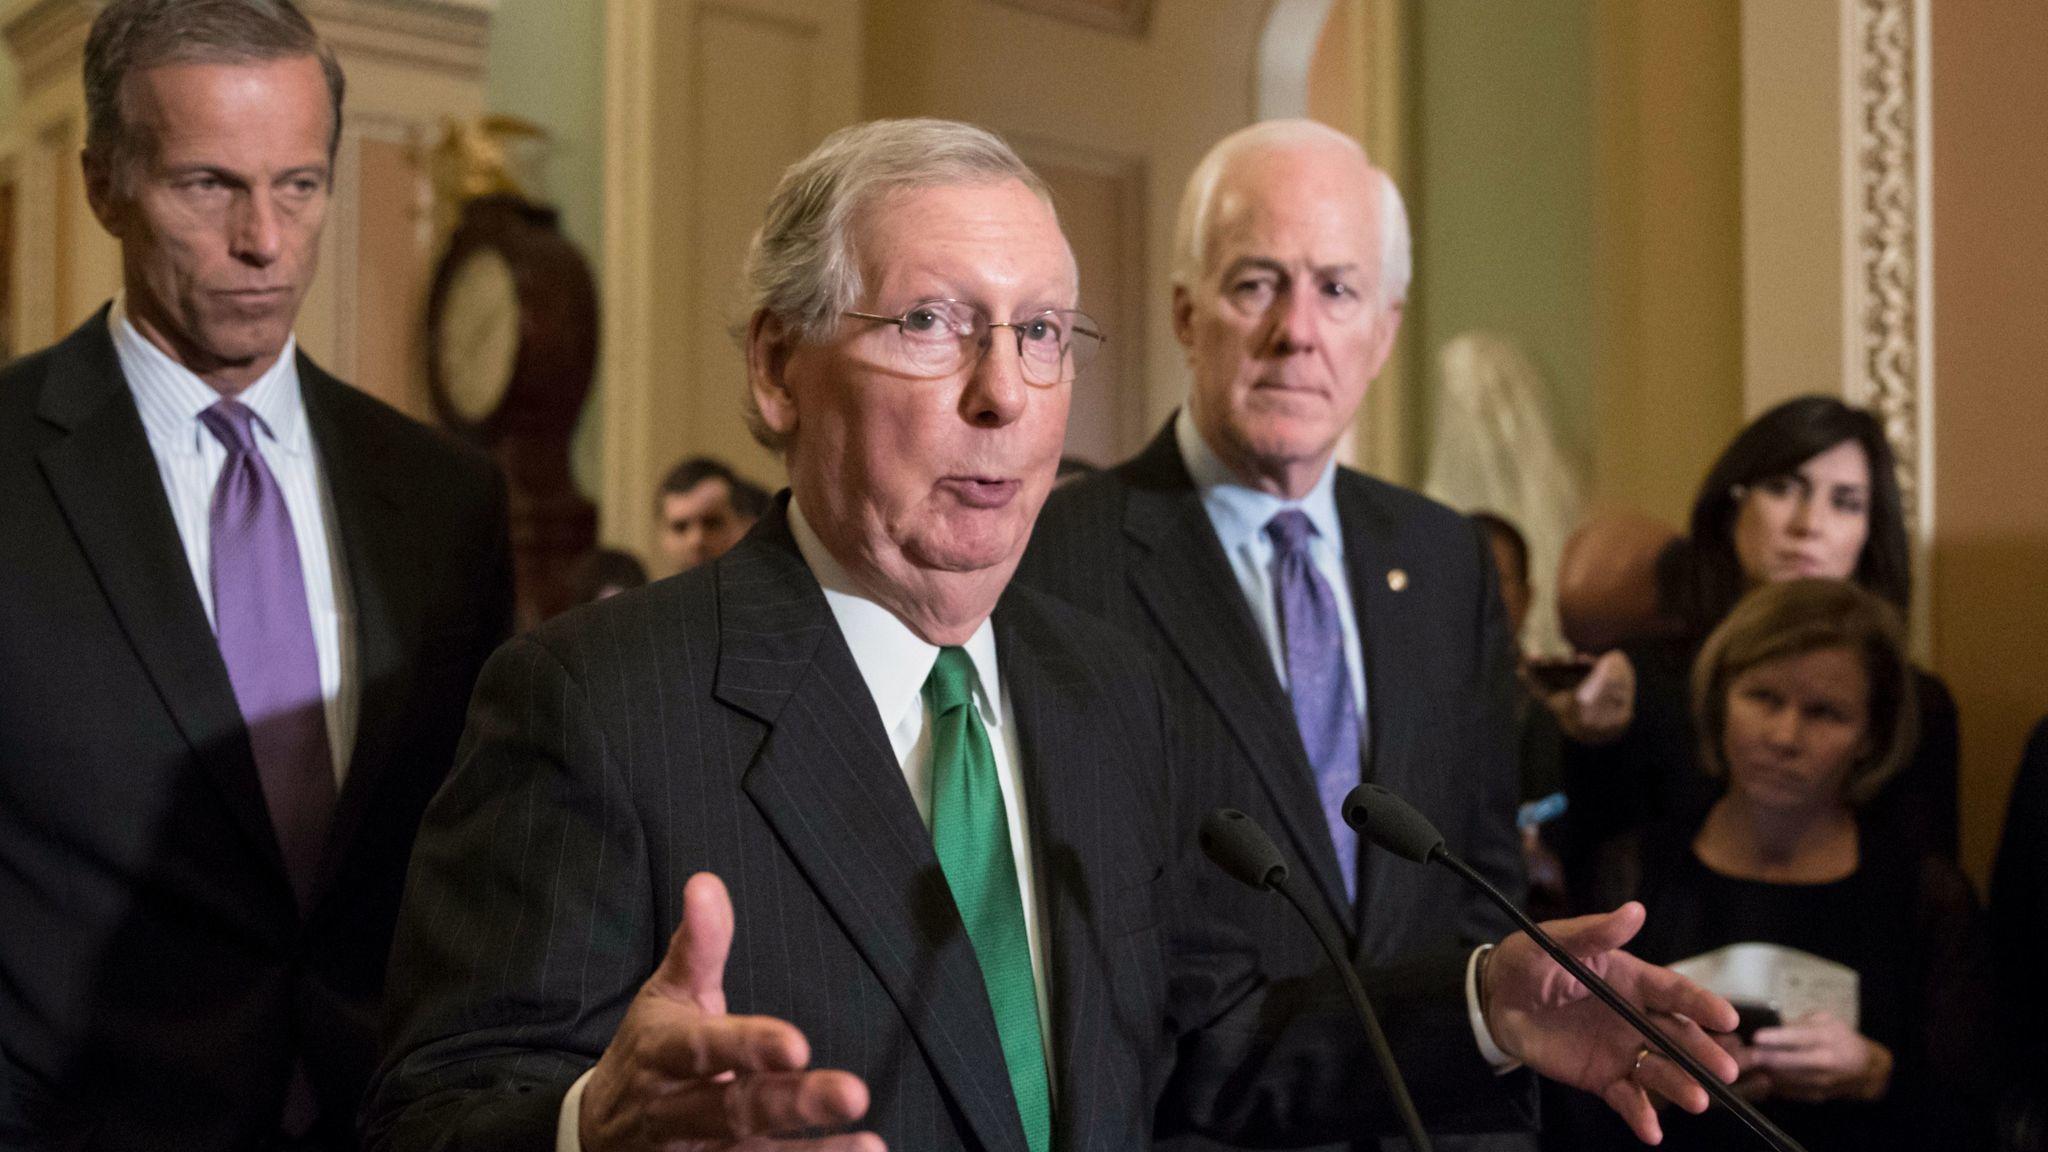 (J. Scott Applewhite / Associated Press)